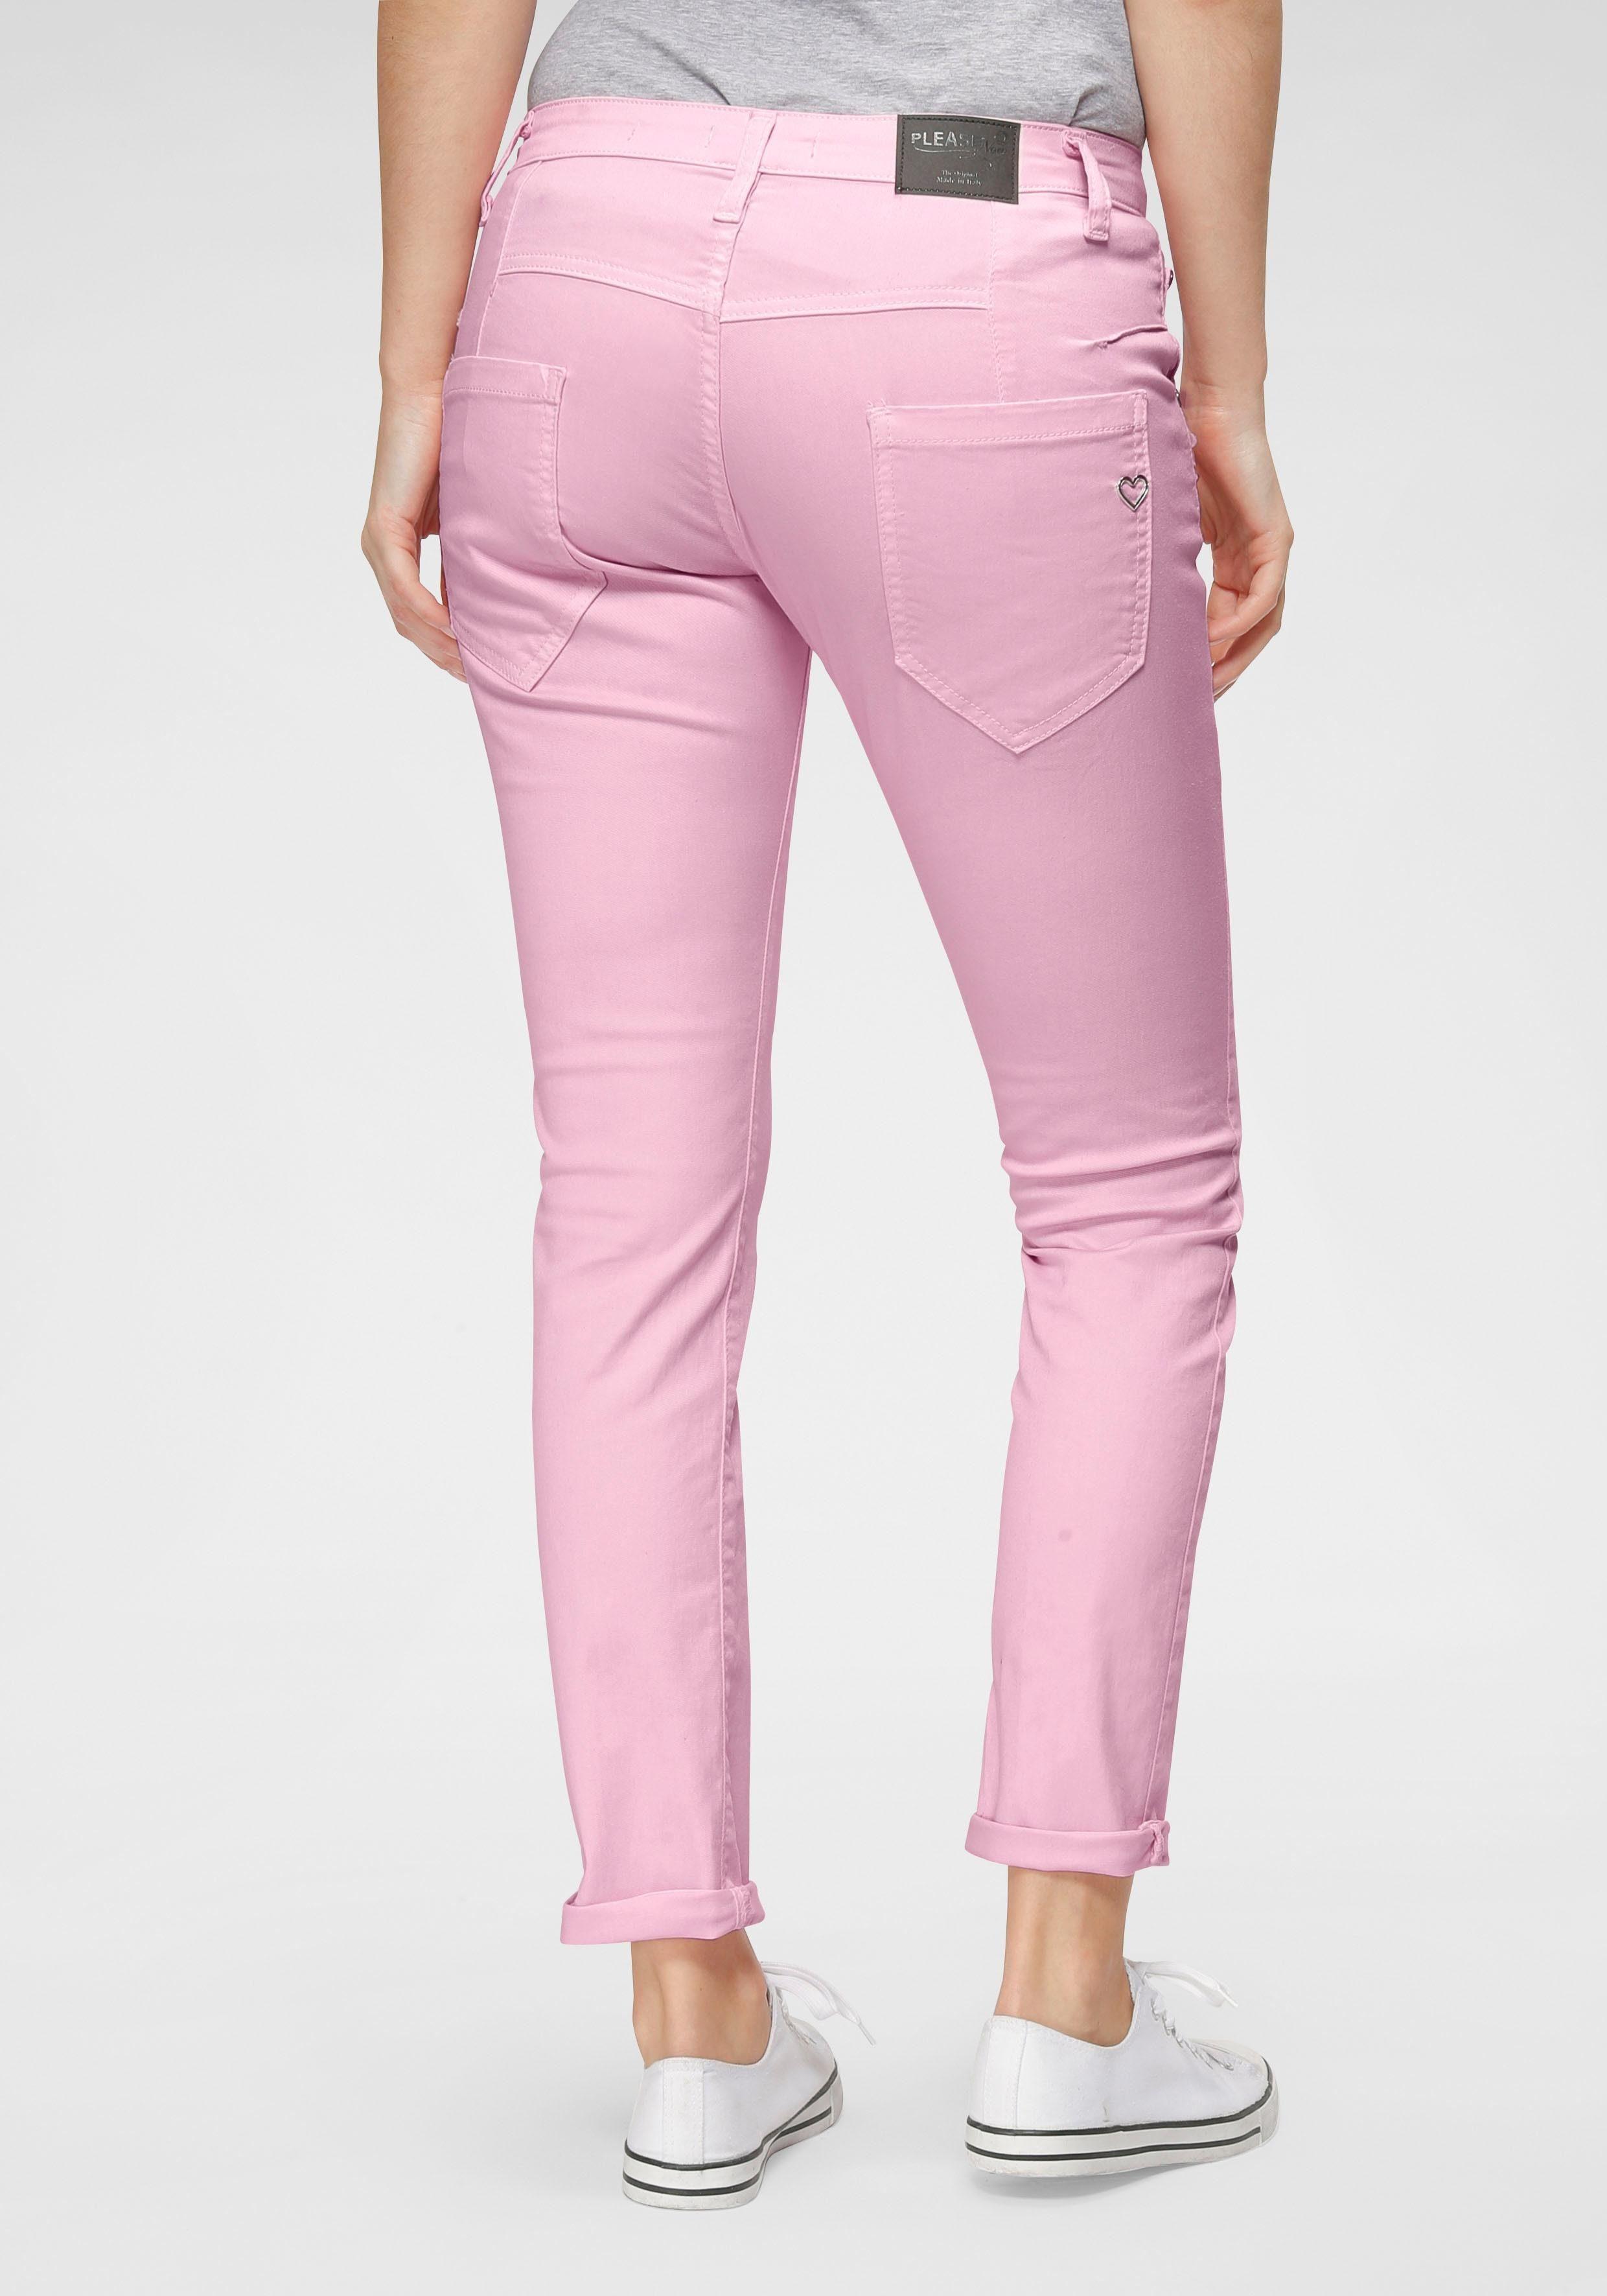 Please Jeans 7//8-Jeans P36H Boyfriend-Fit Crinkleoptik Blue Denim 1670 Neu